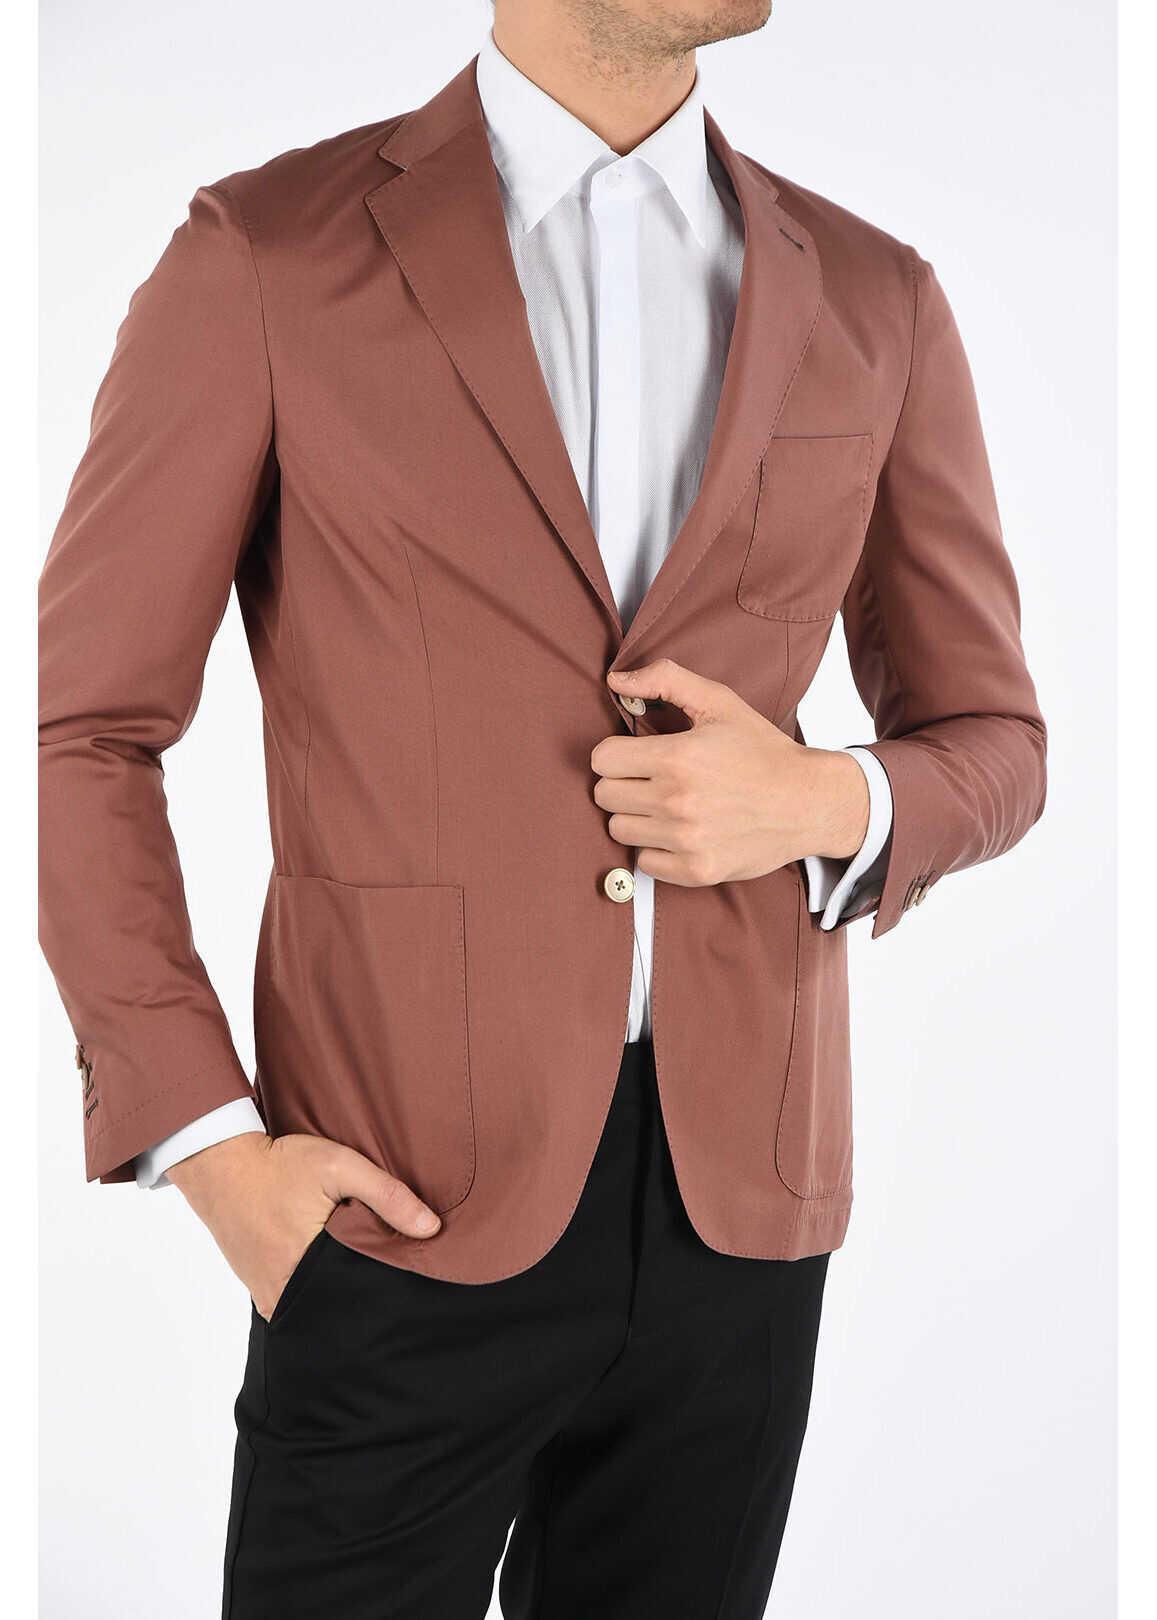 CORNELIANI ID silk side vents 2-button IDENTITY blazer BROWN imagine